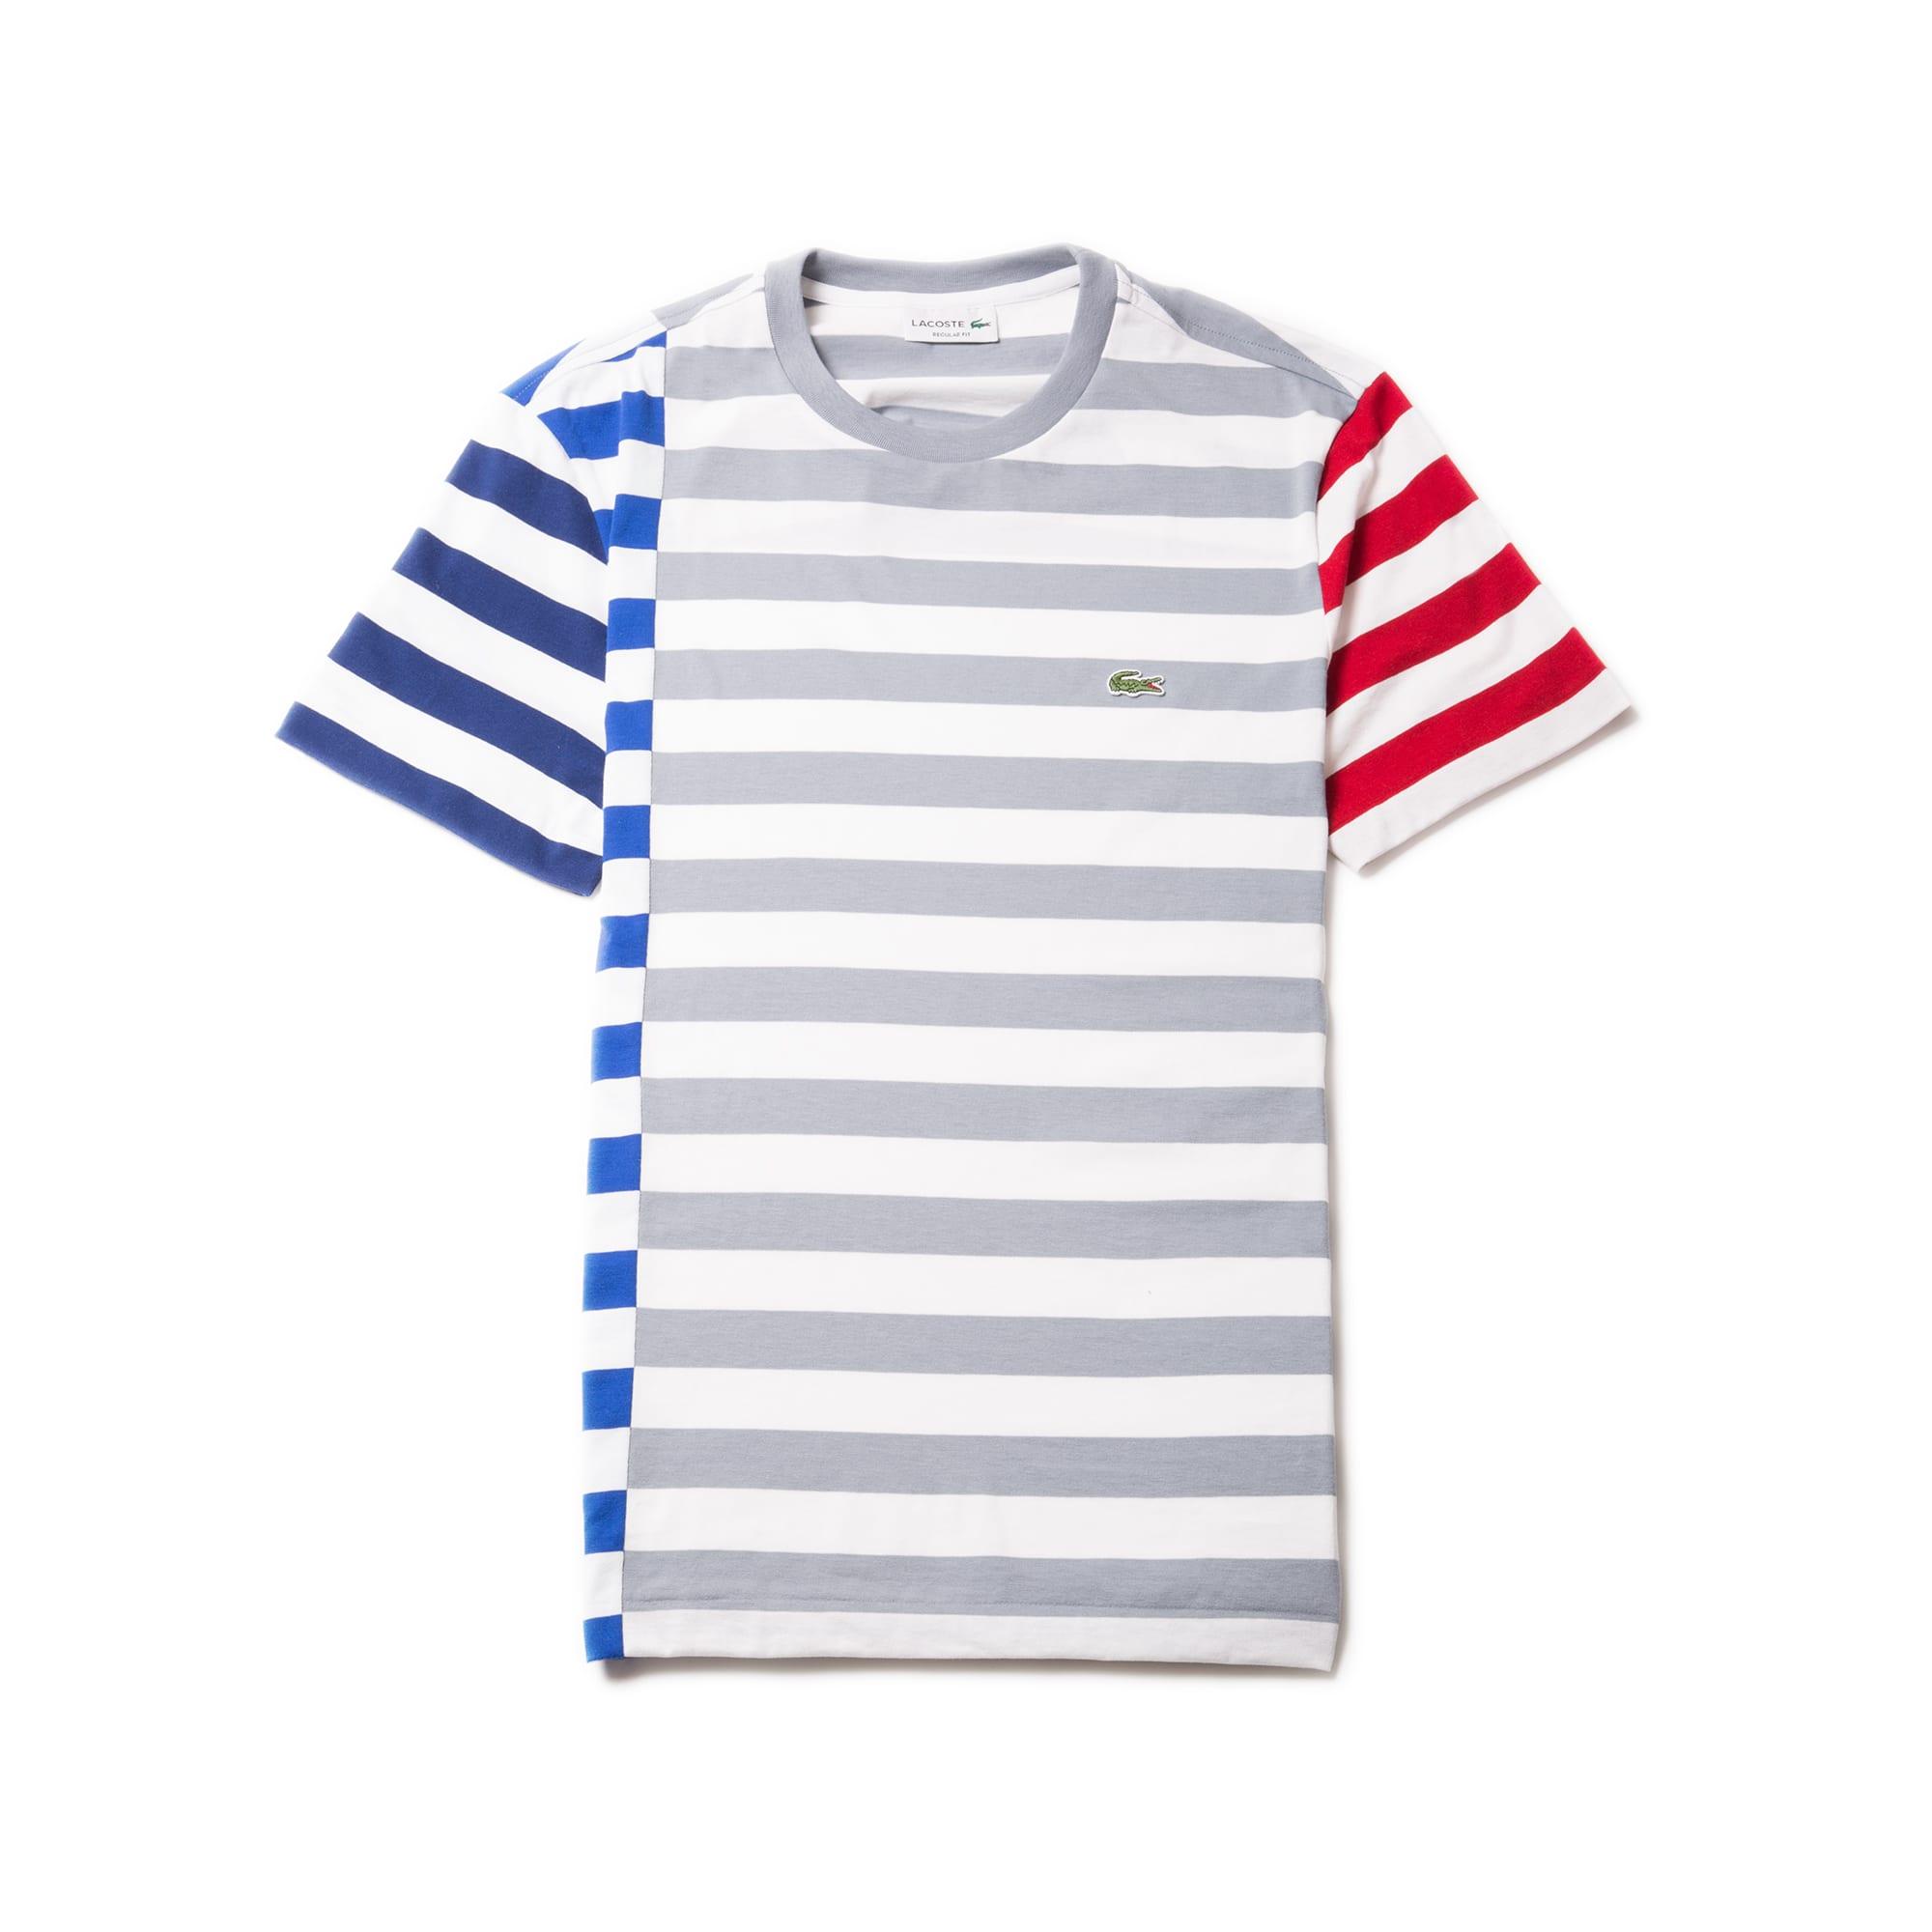 Men's Crew Neck Off-Center Stripes Cotton Jersey T-shirt